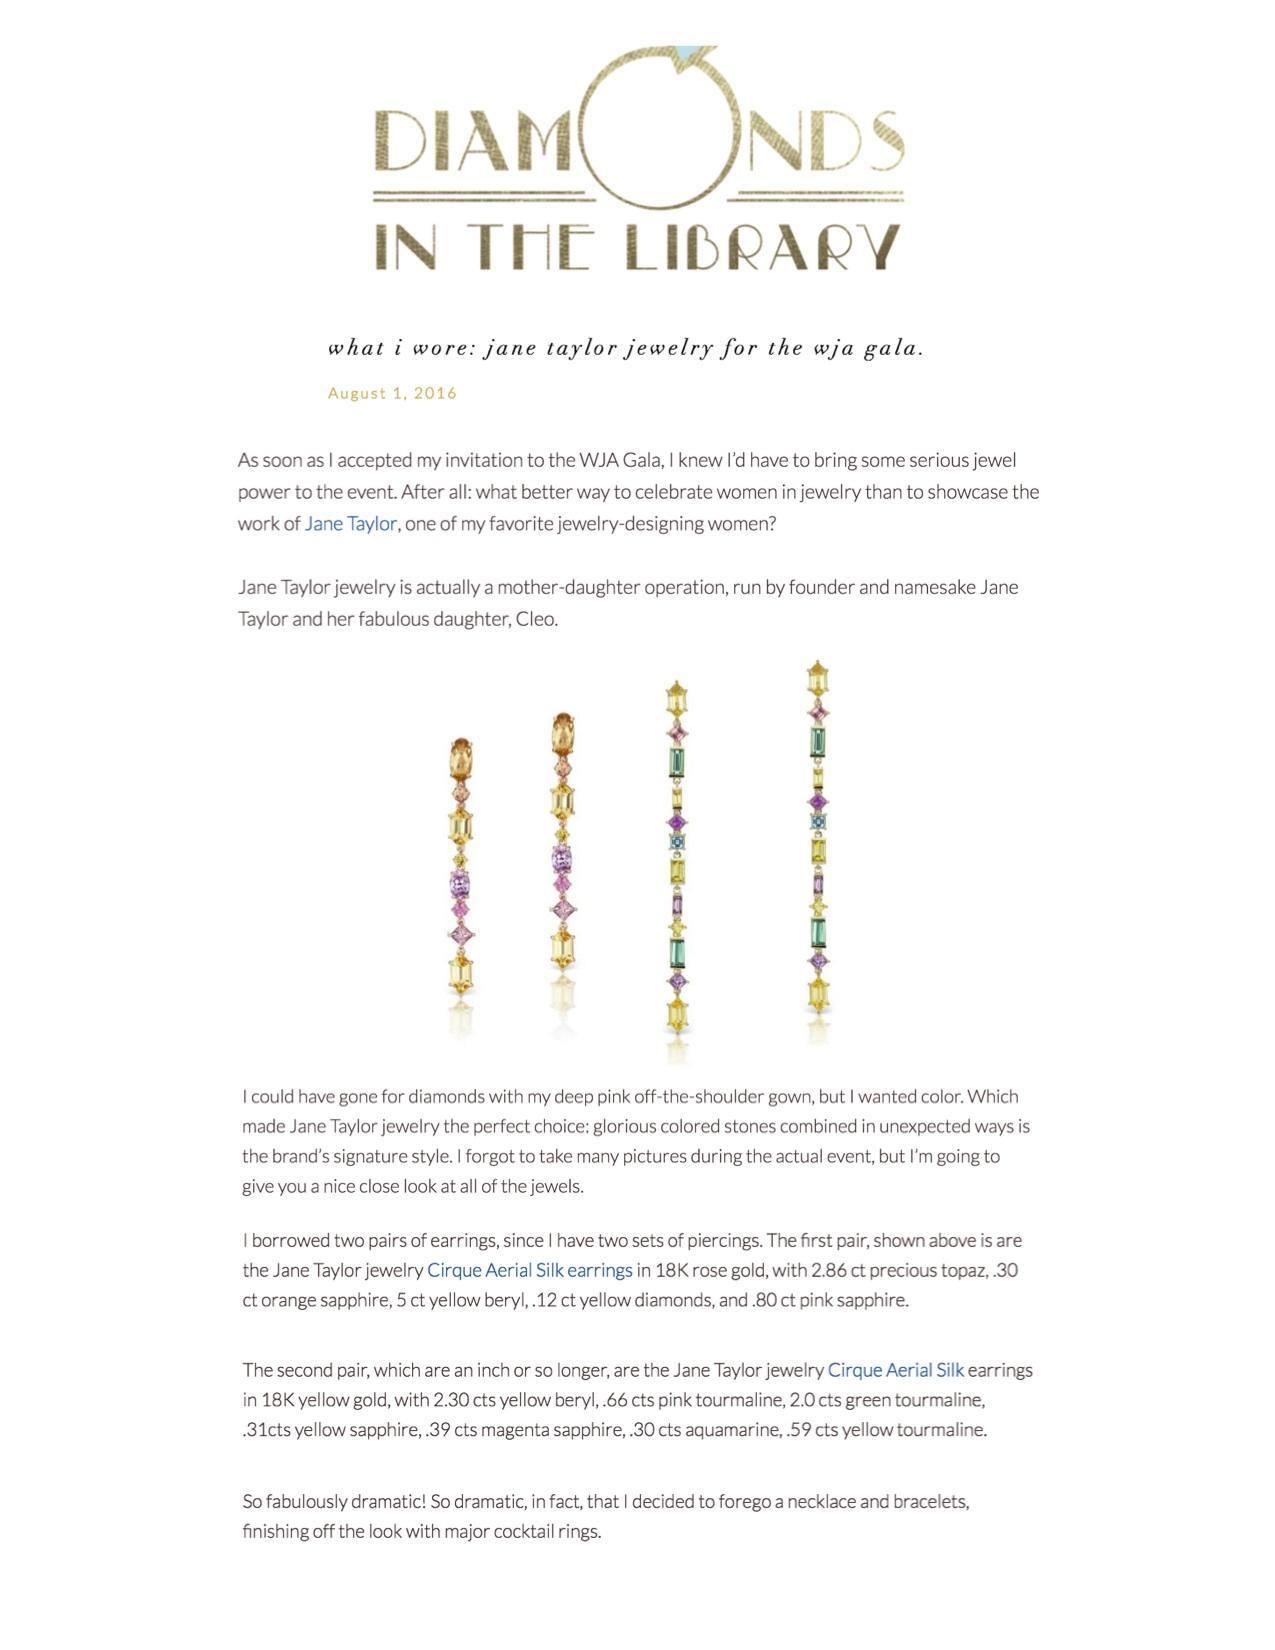 2016-8.1-Diamonds in the Library.jpg